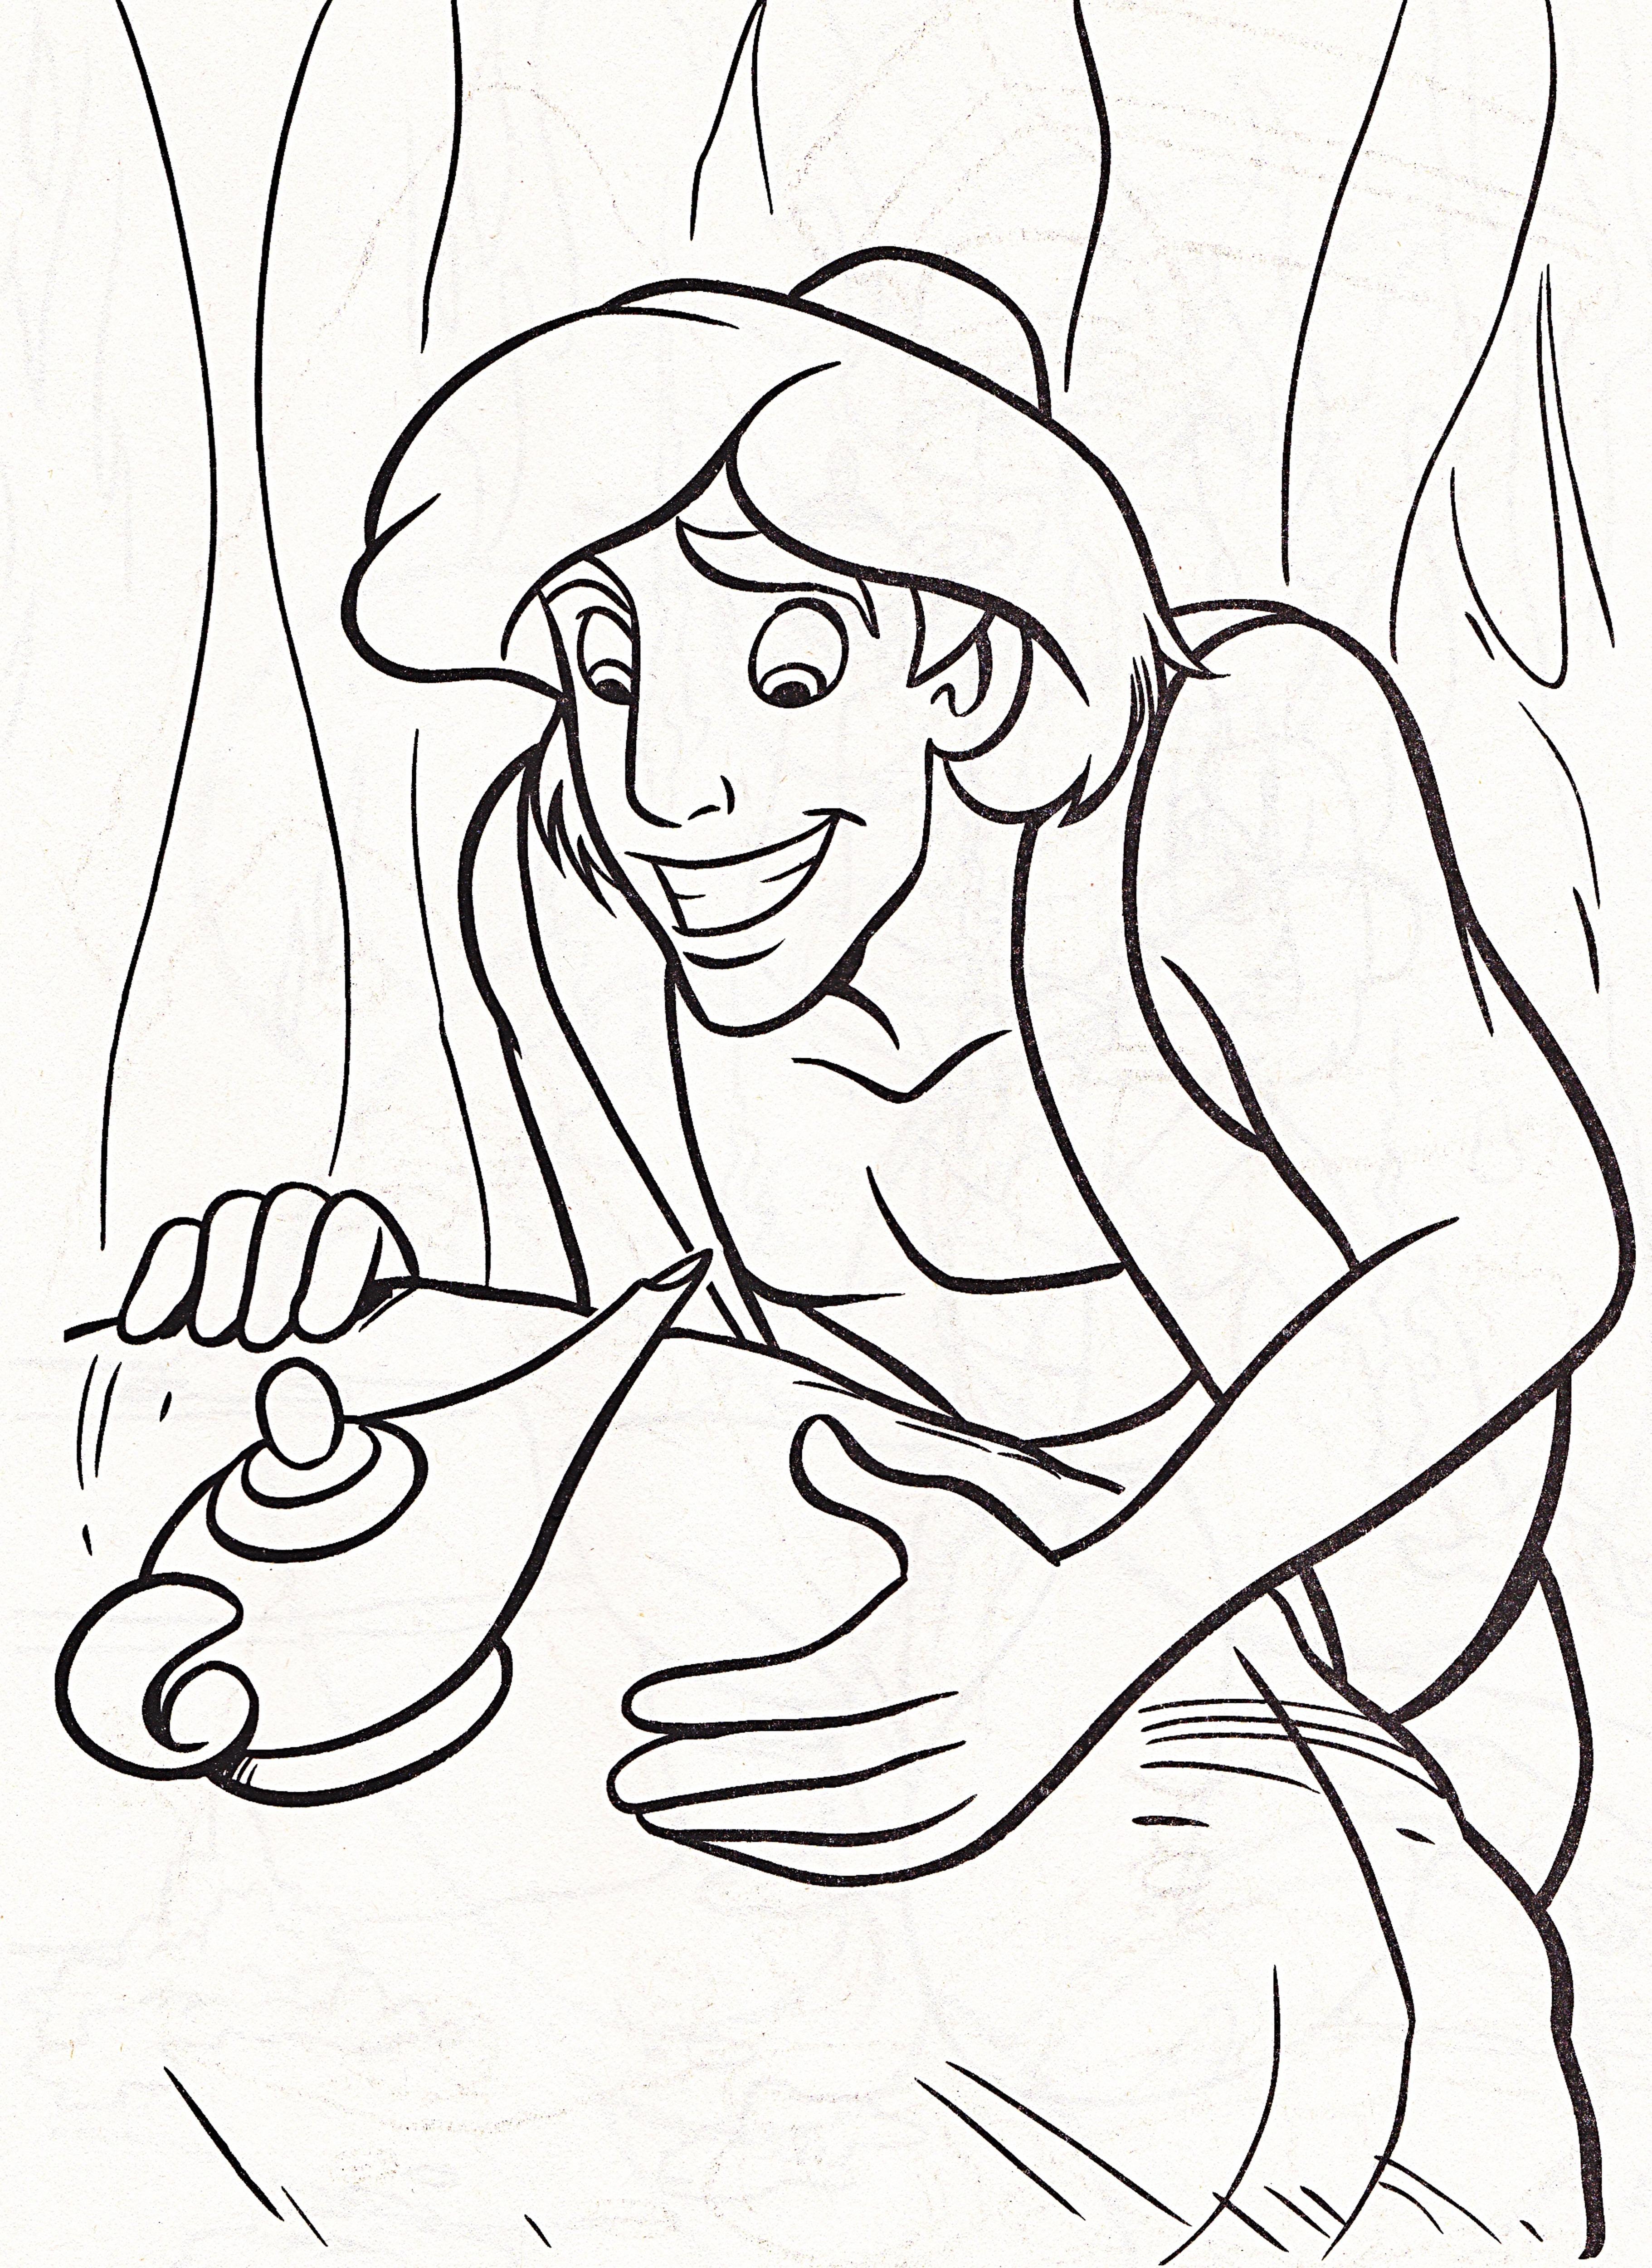 Walt Disney Coloring Pages - Prince Aladdin